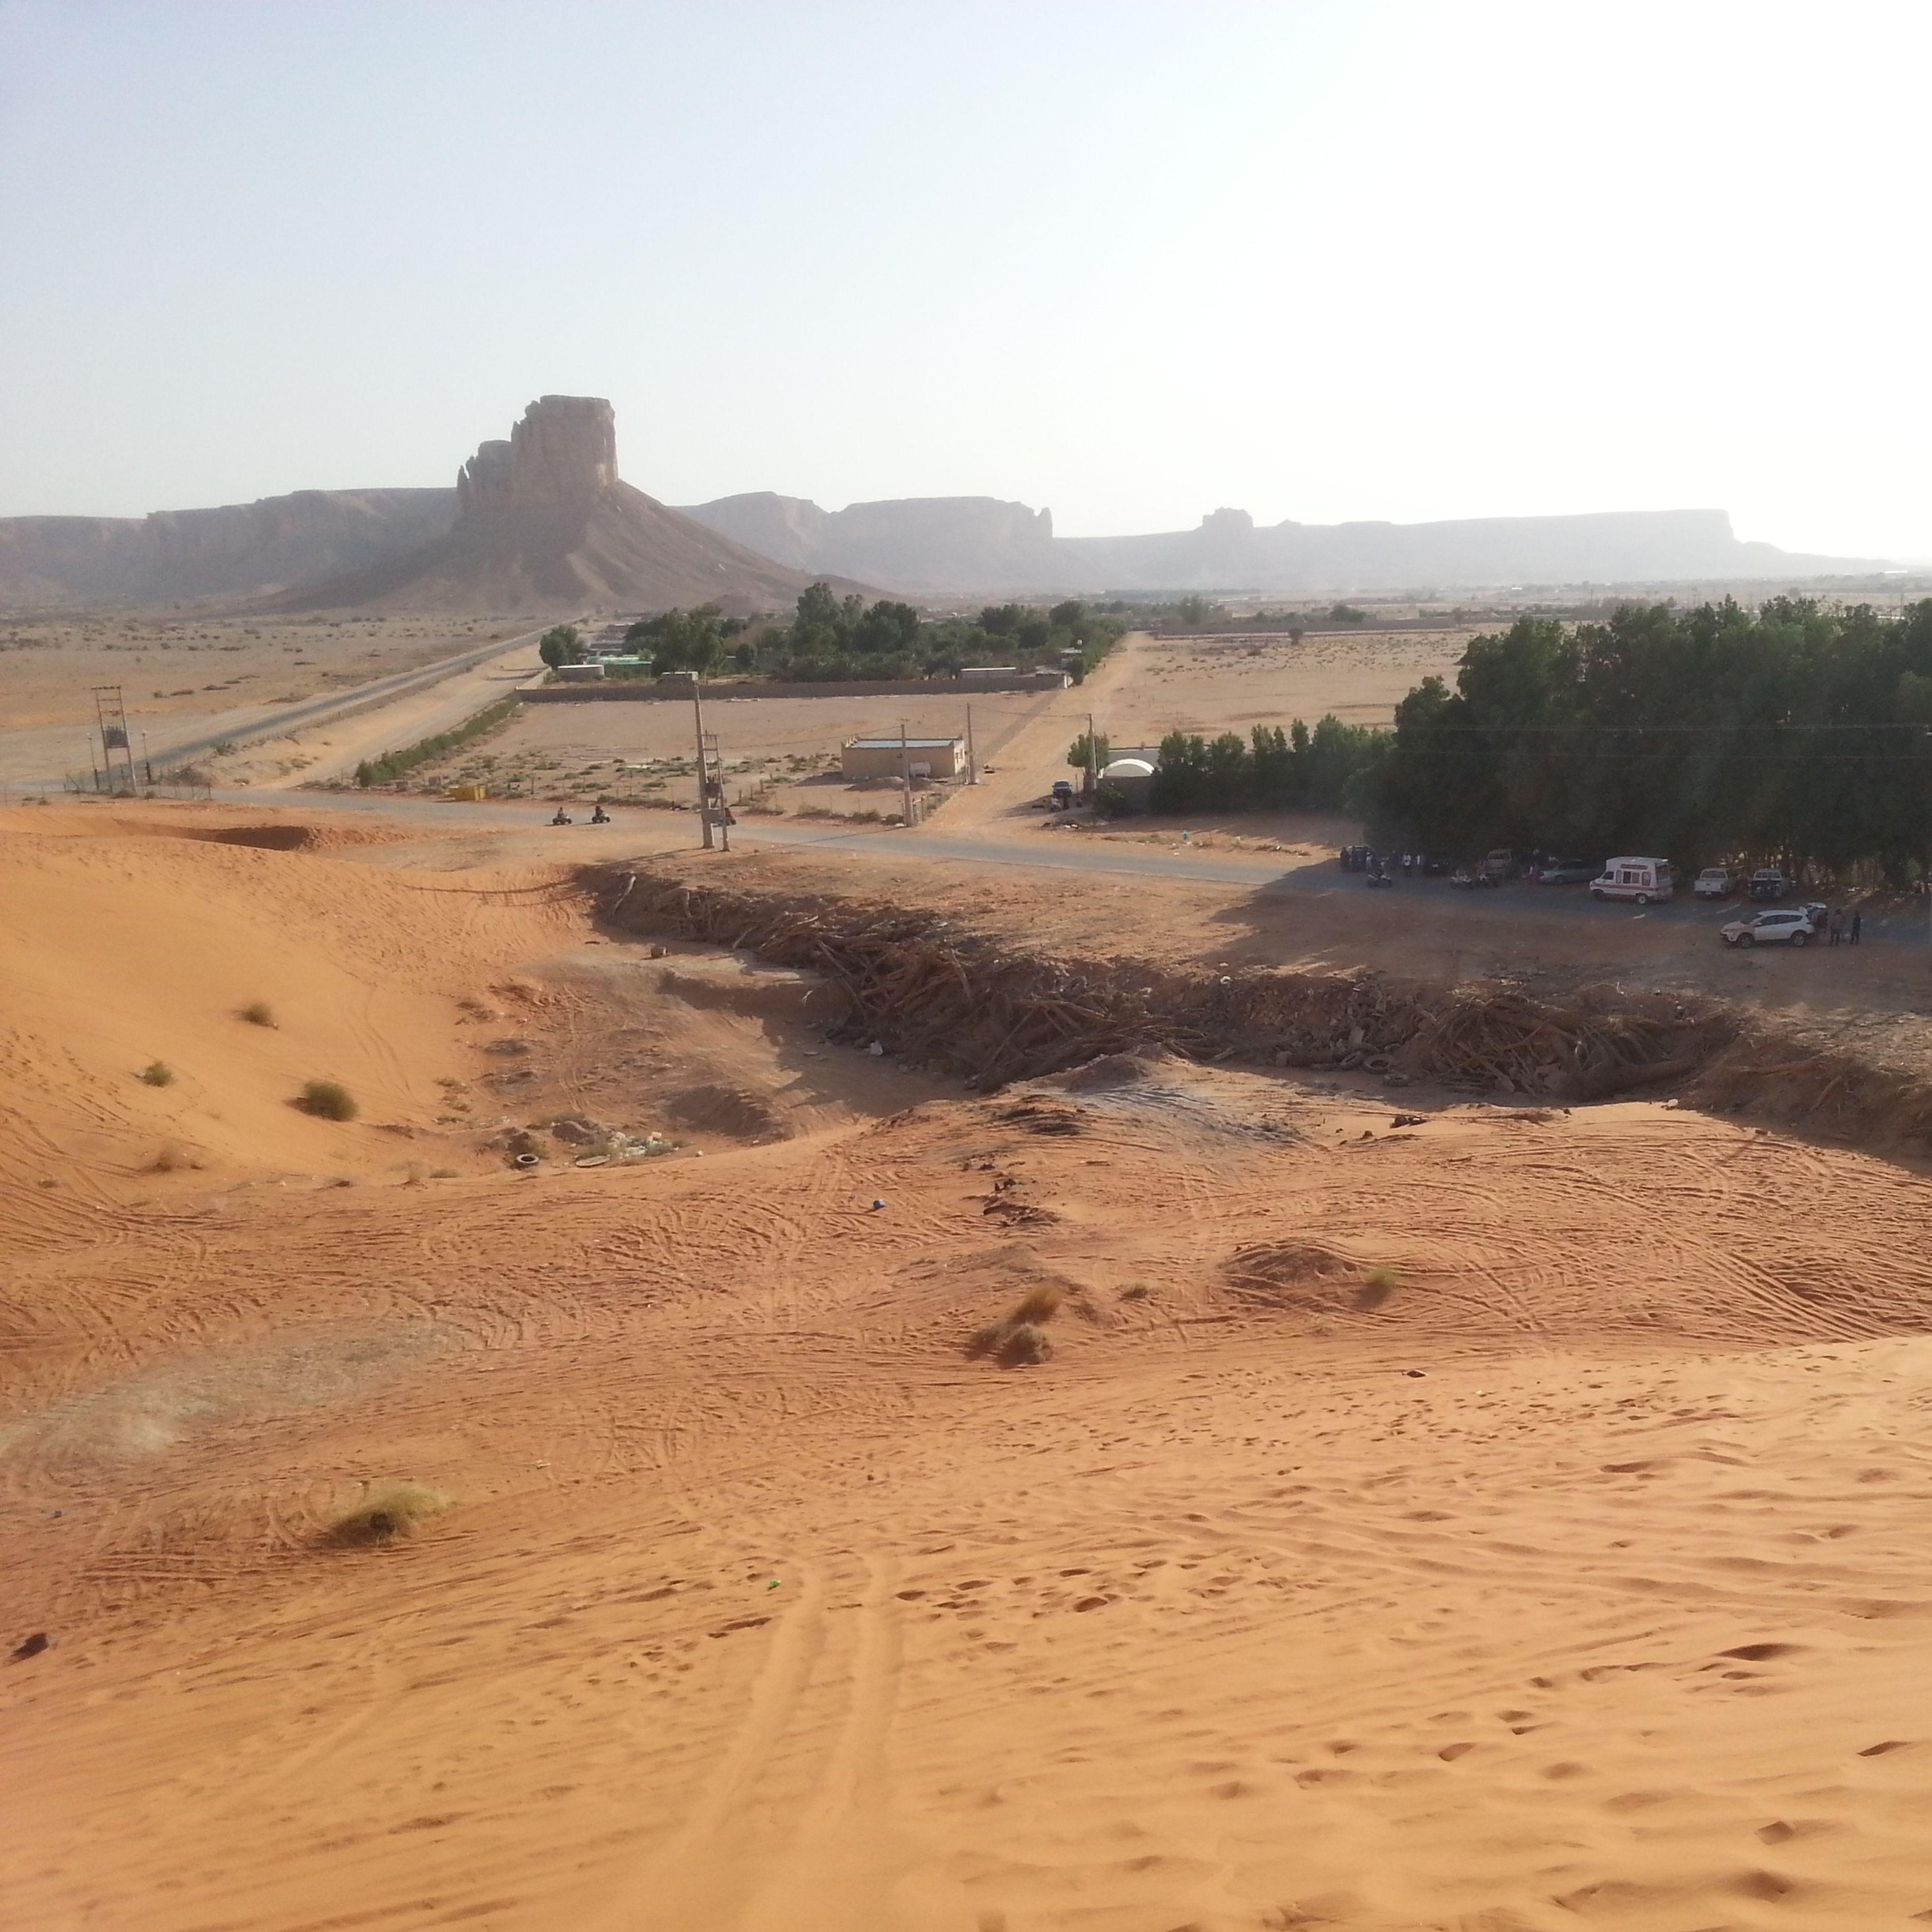 sand, desert, arid climate, clear sky, landscape, sand dune, tranquil scene, tranquility, scenics, nature, barren, mountain, beauty in nature, remote, arid landscape, non-urban scene, dirt road, sunlight, beach, incidental people